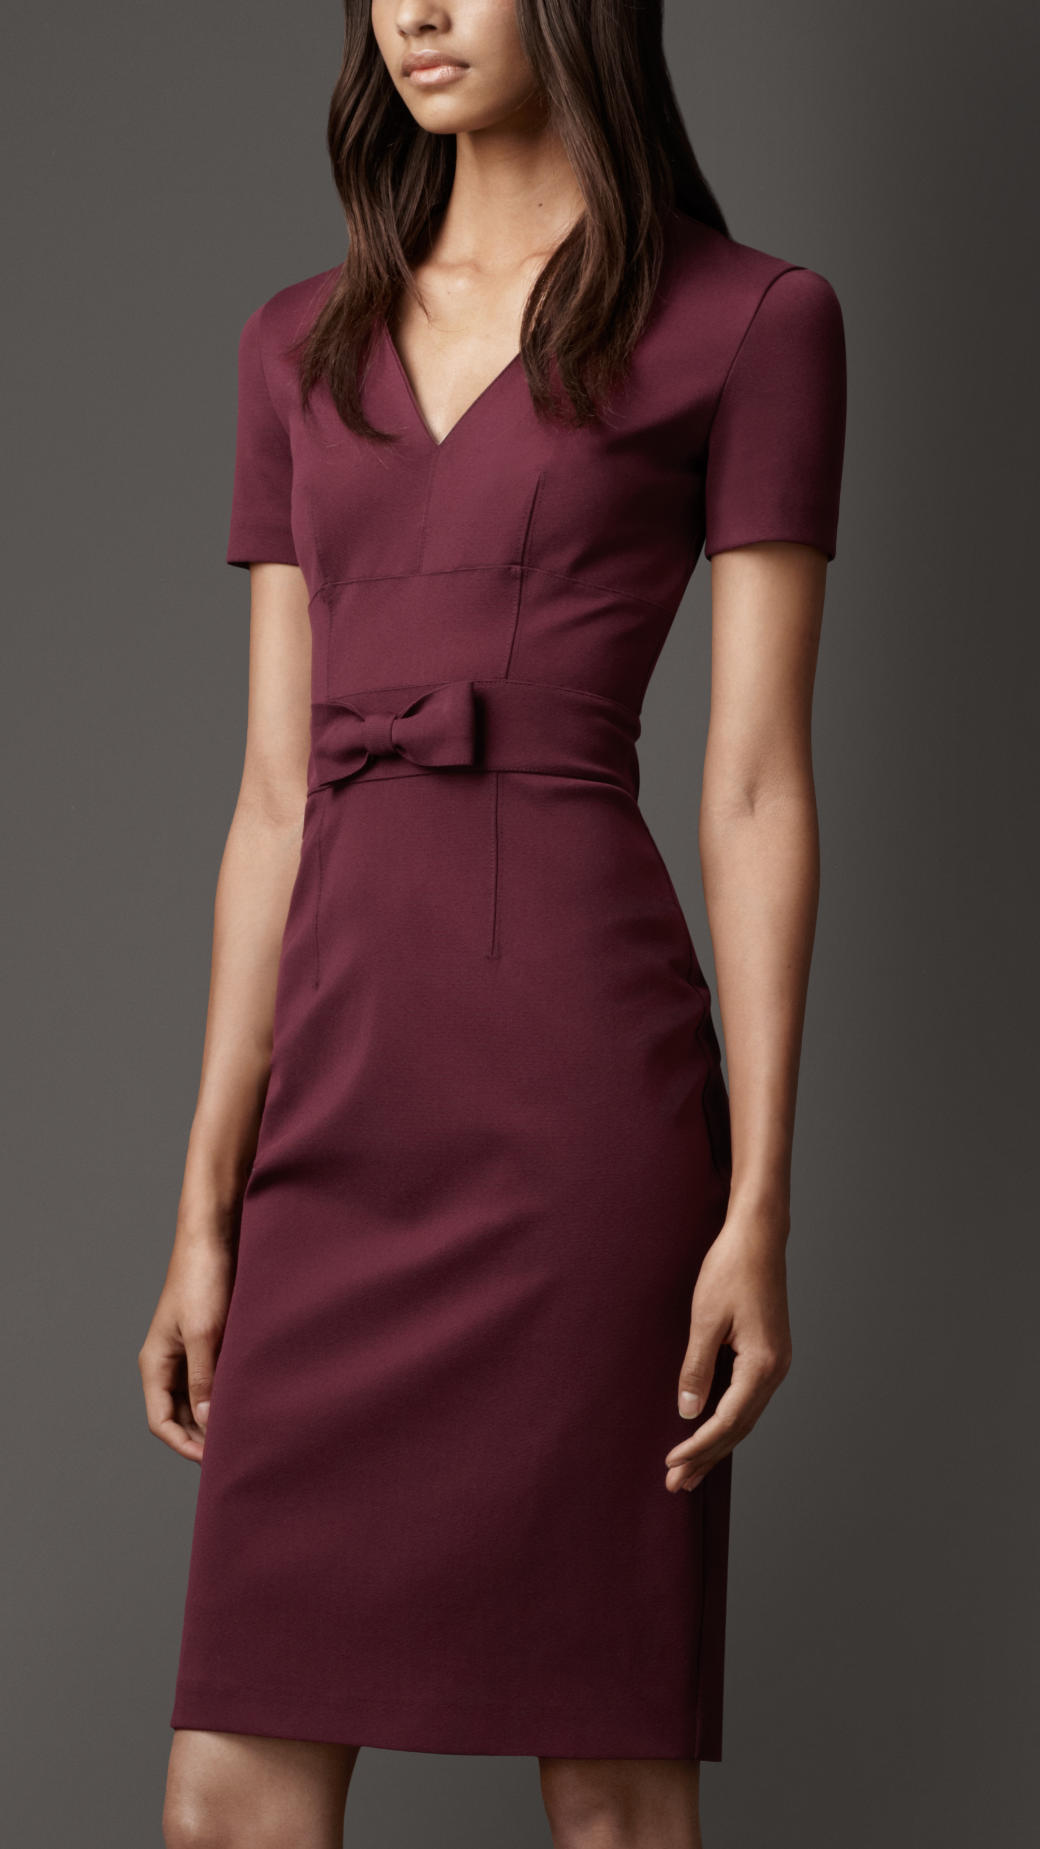 8c713f464aa Lyst - Burberry Bow Detail Dress in Purple